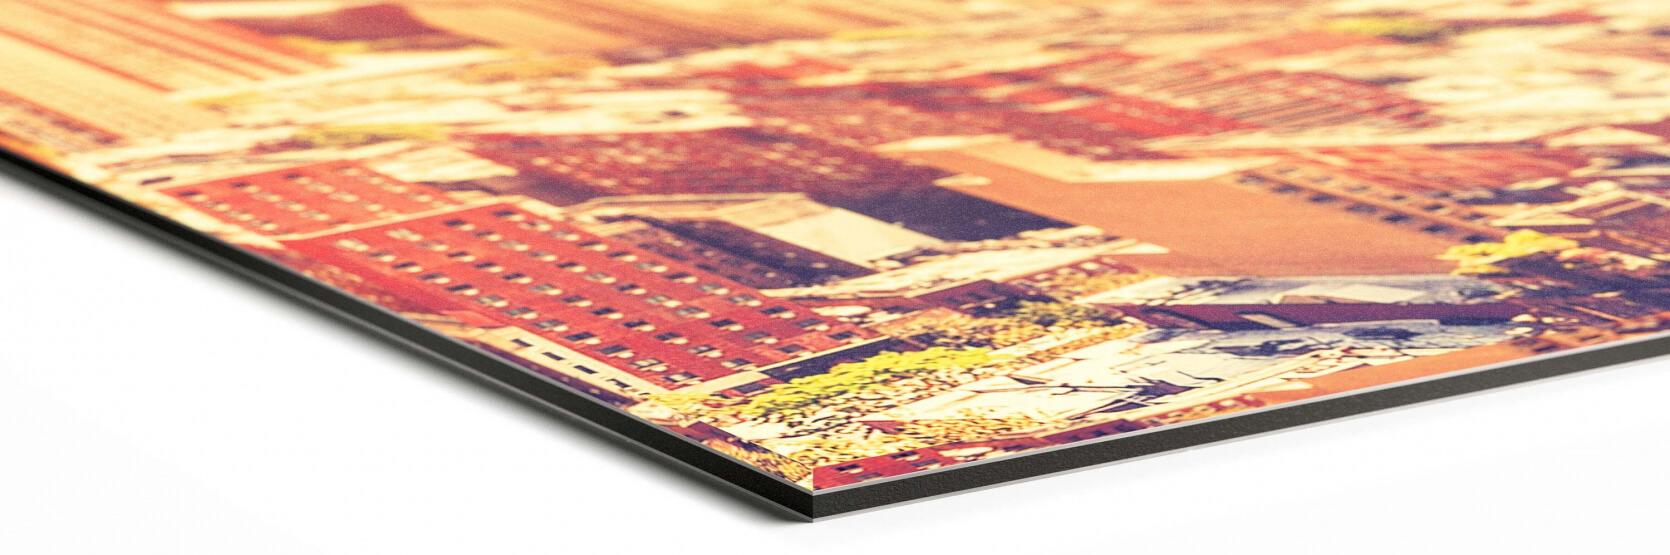 hoek foto op plexiglas anti reflex / mat